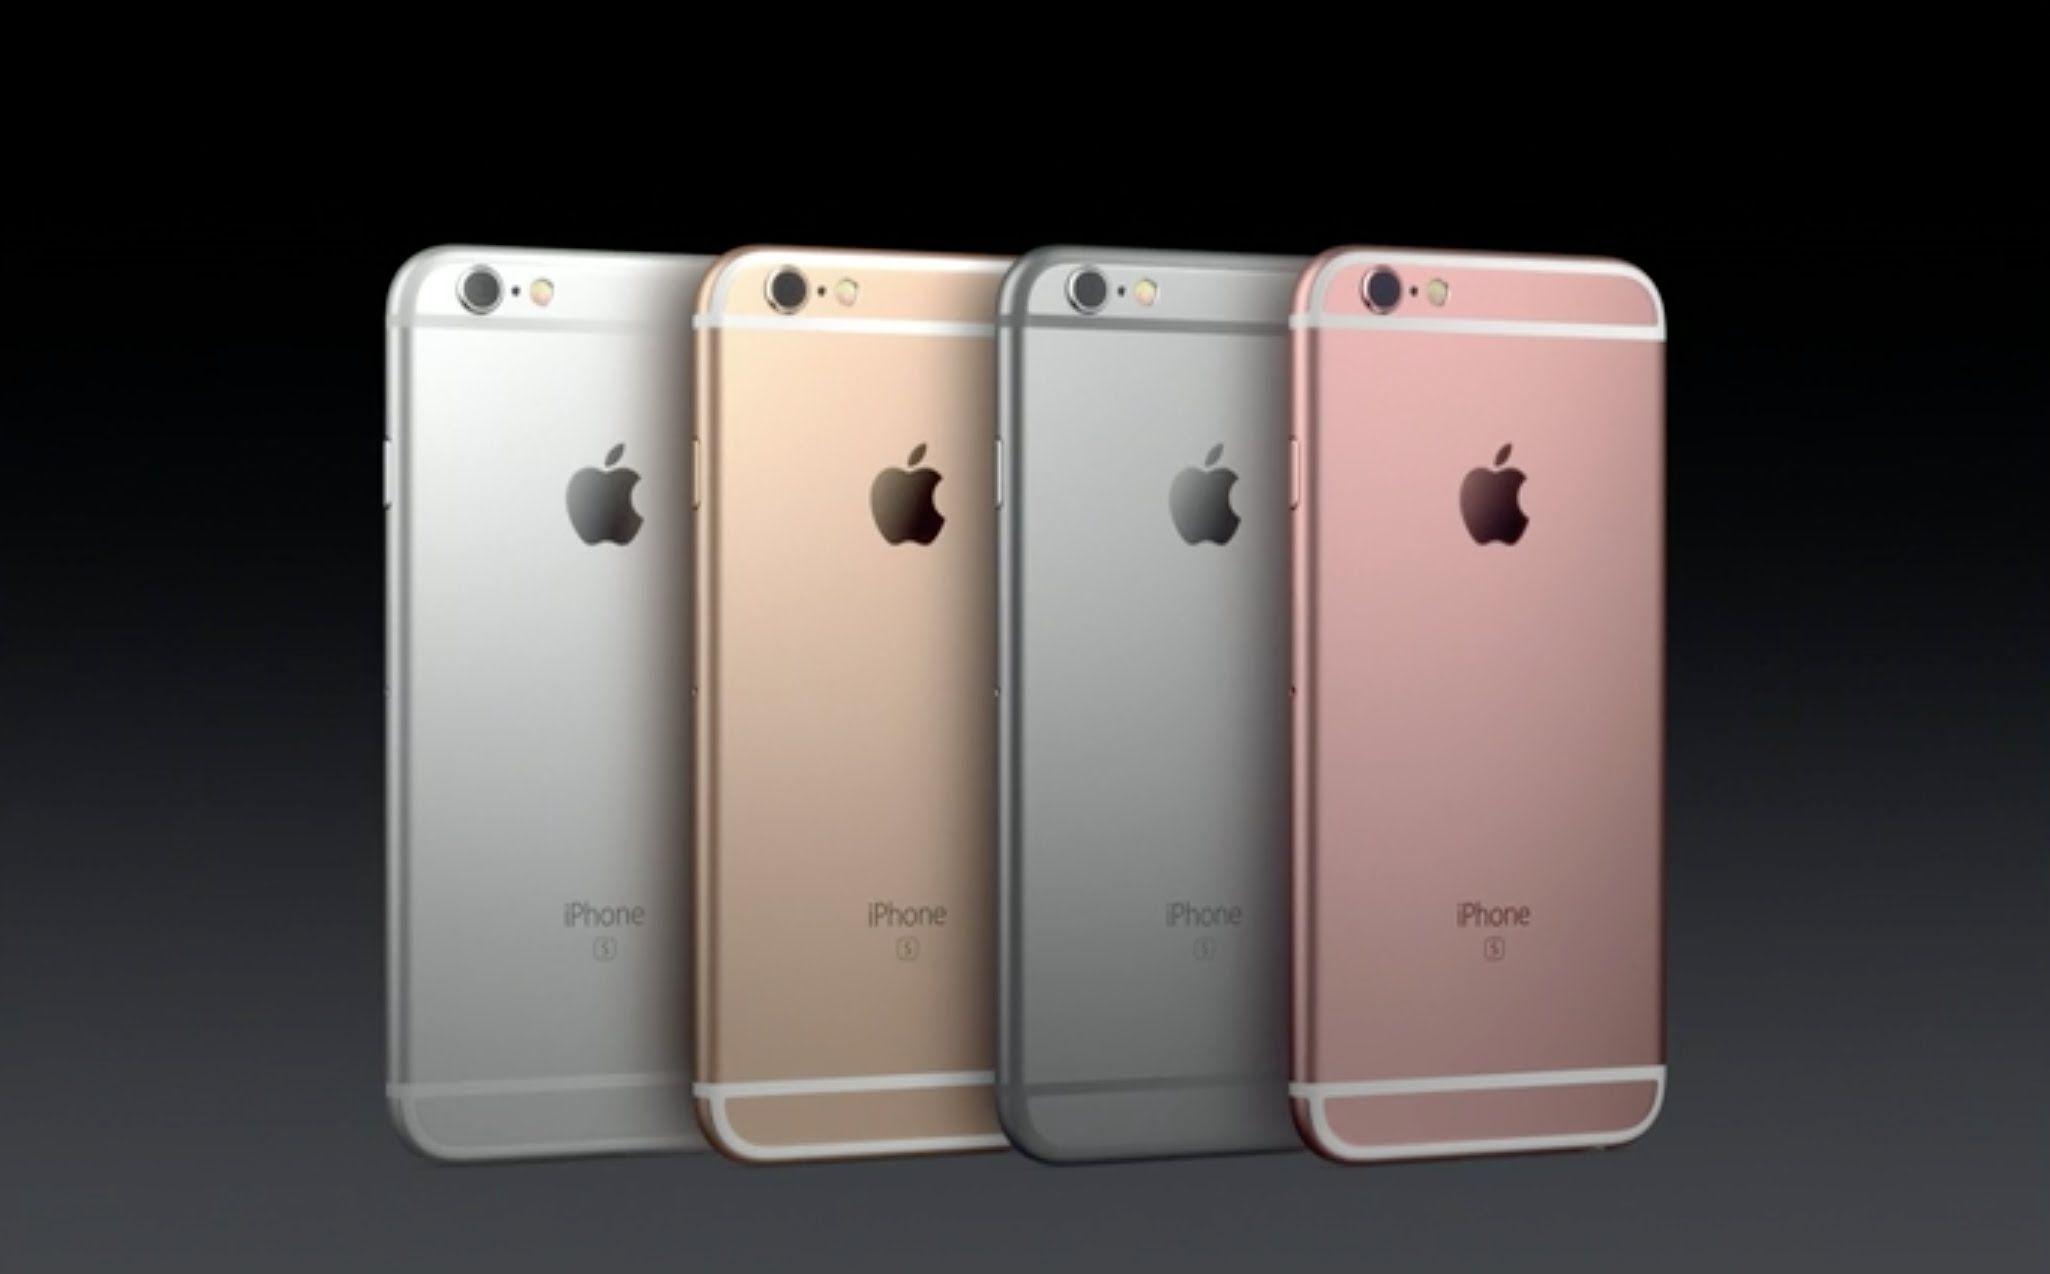 iPhone I'm sorry I'll try harder Siri ringtone (remix by